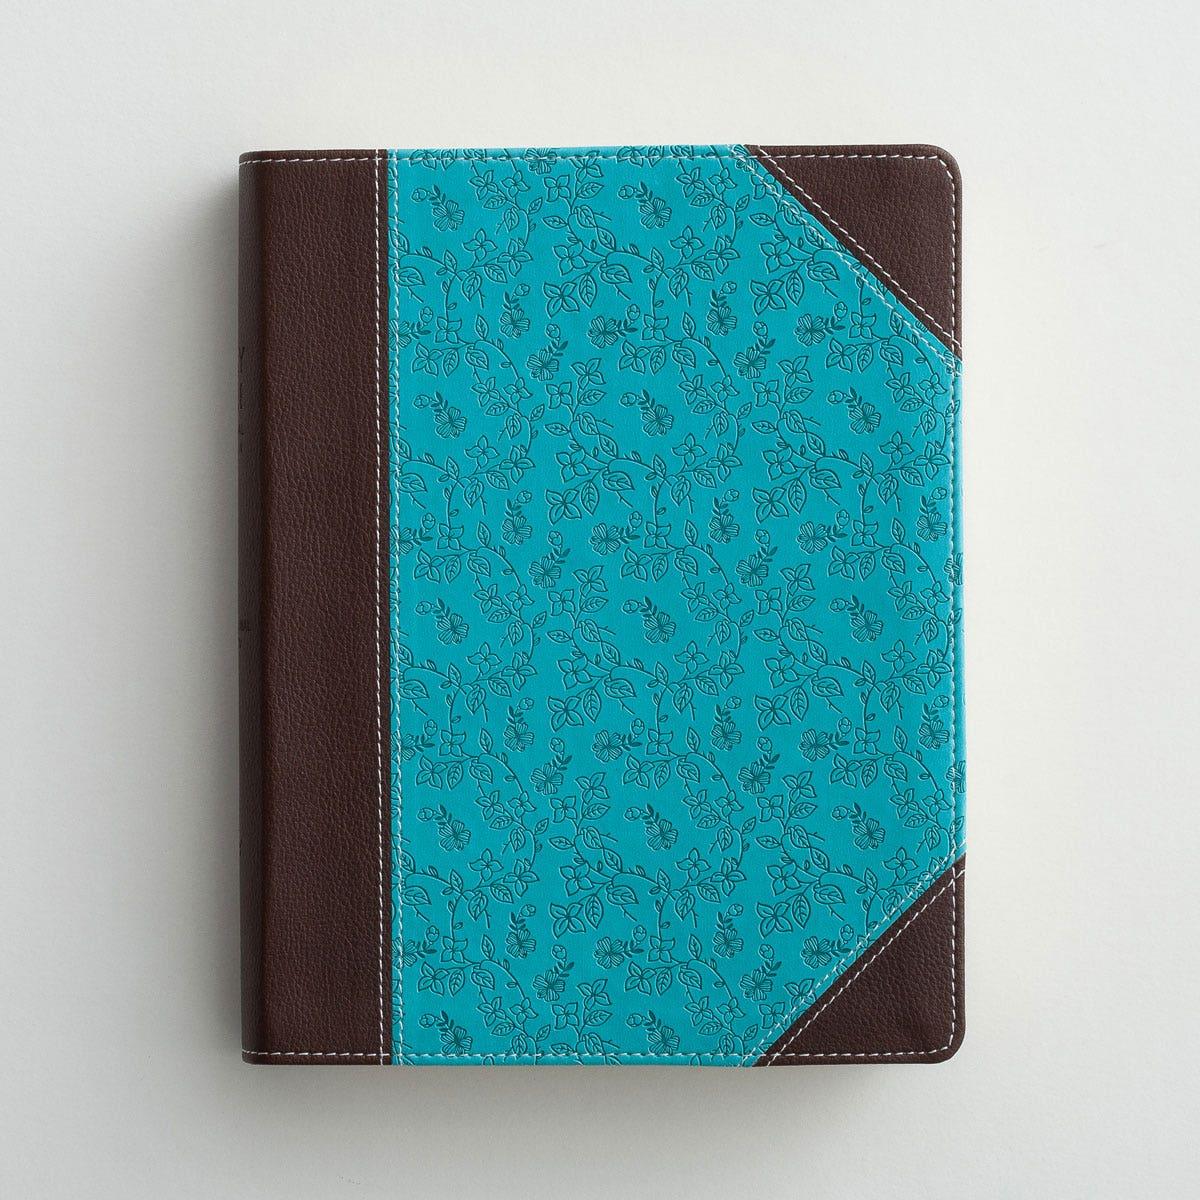 NIV Journal the Word Bible, Single Column